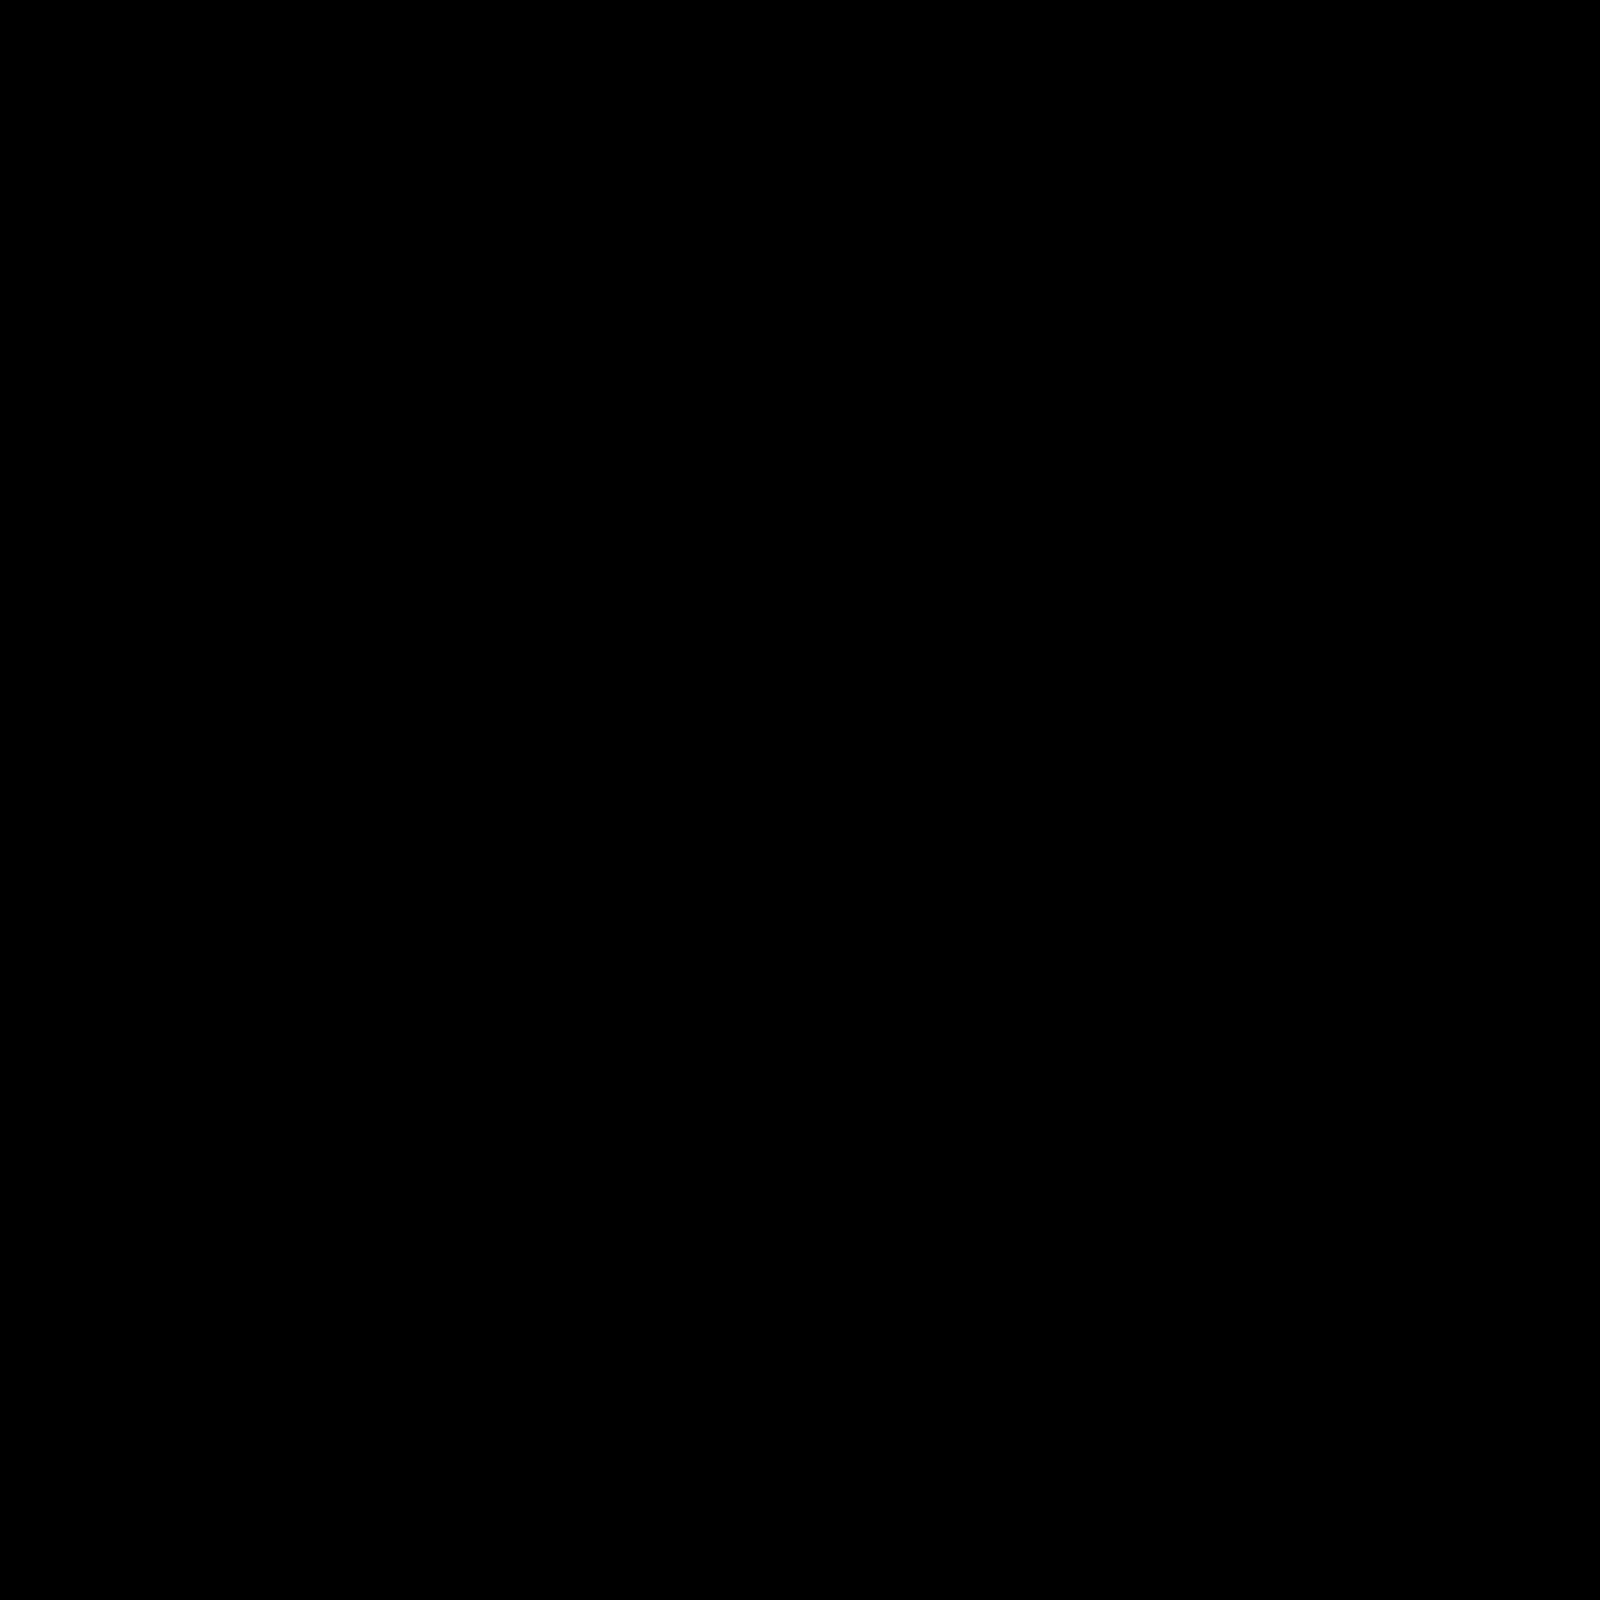 Pattern Formula Magic Script Folding Space NTP Meaningful Panorama